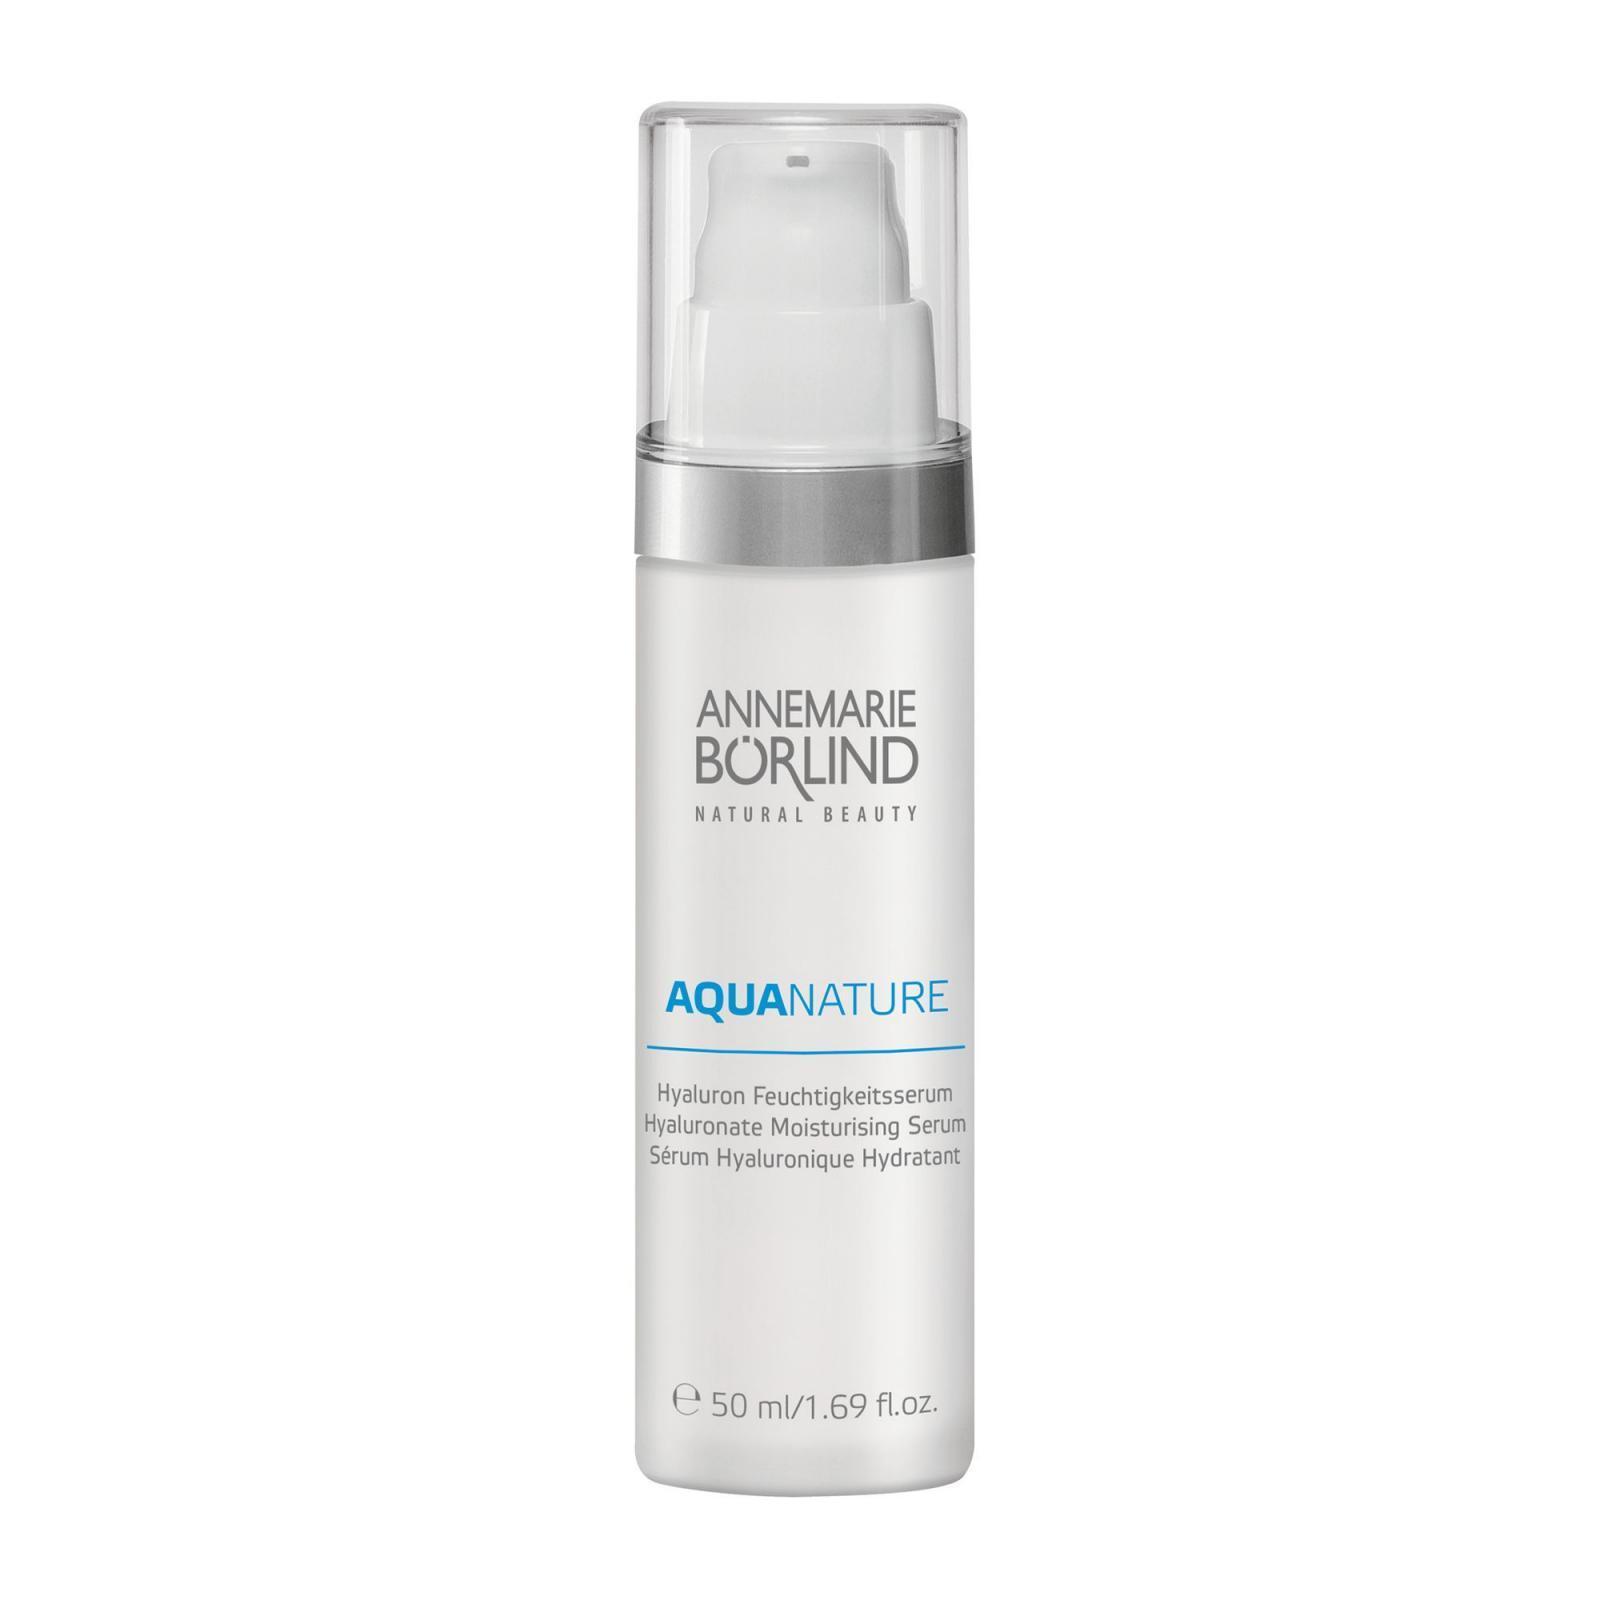 Annemarie Borlind Hyaluronové hydratační sérum, Aquanature 50 ml